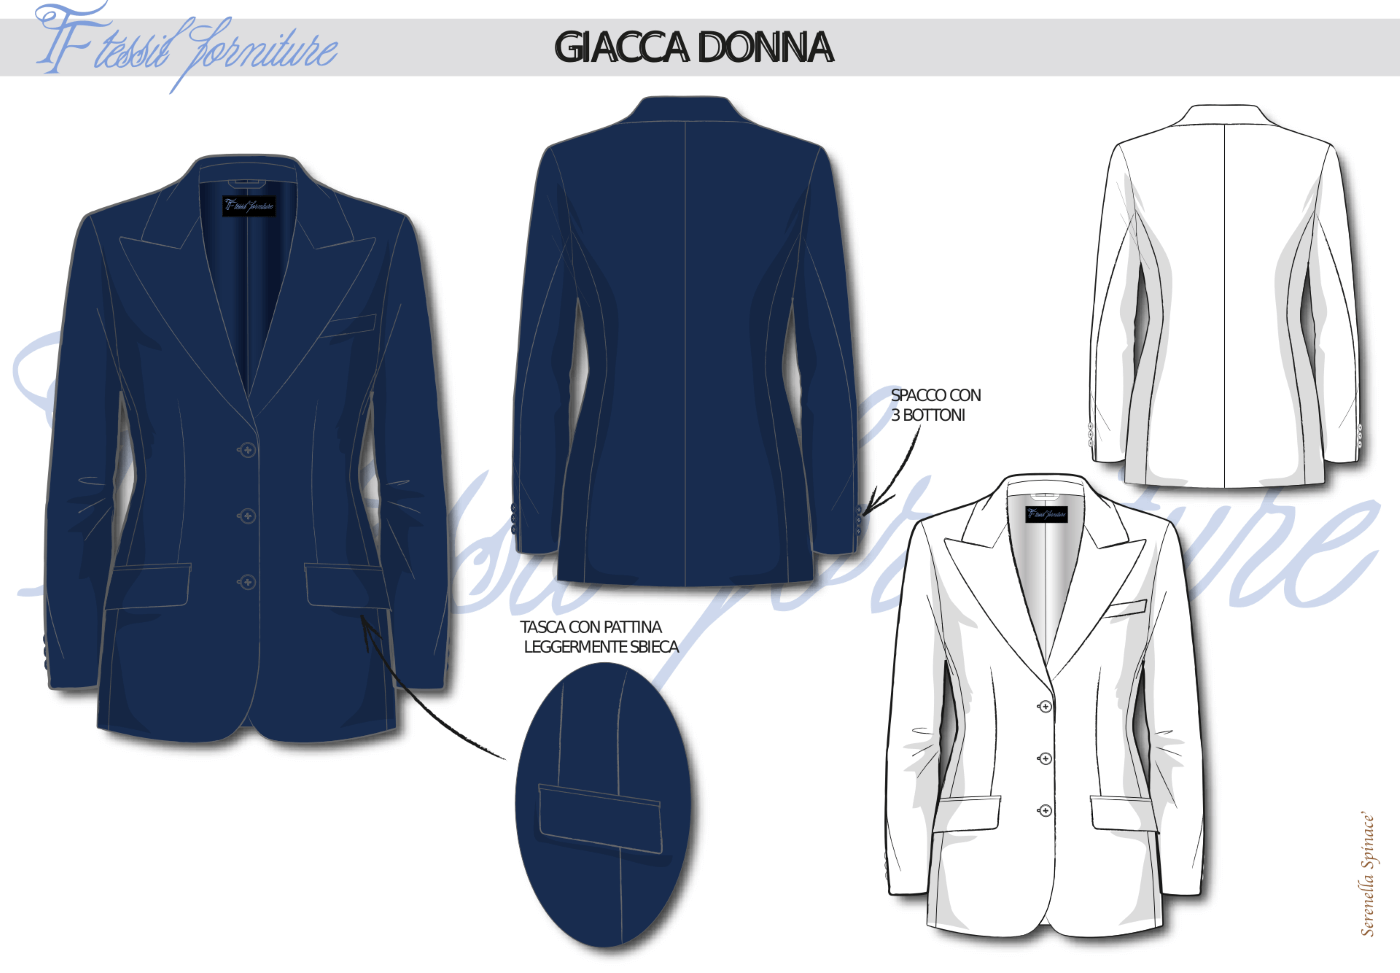 Bozzetto giacca donna - Tessil Forniture